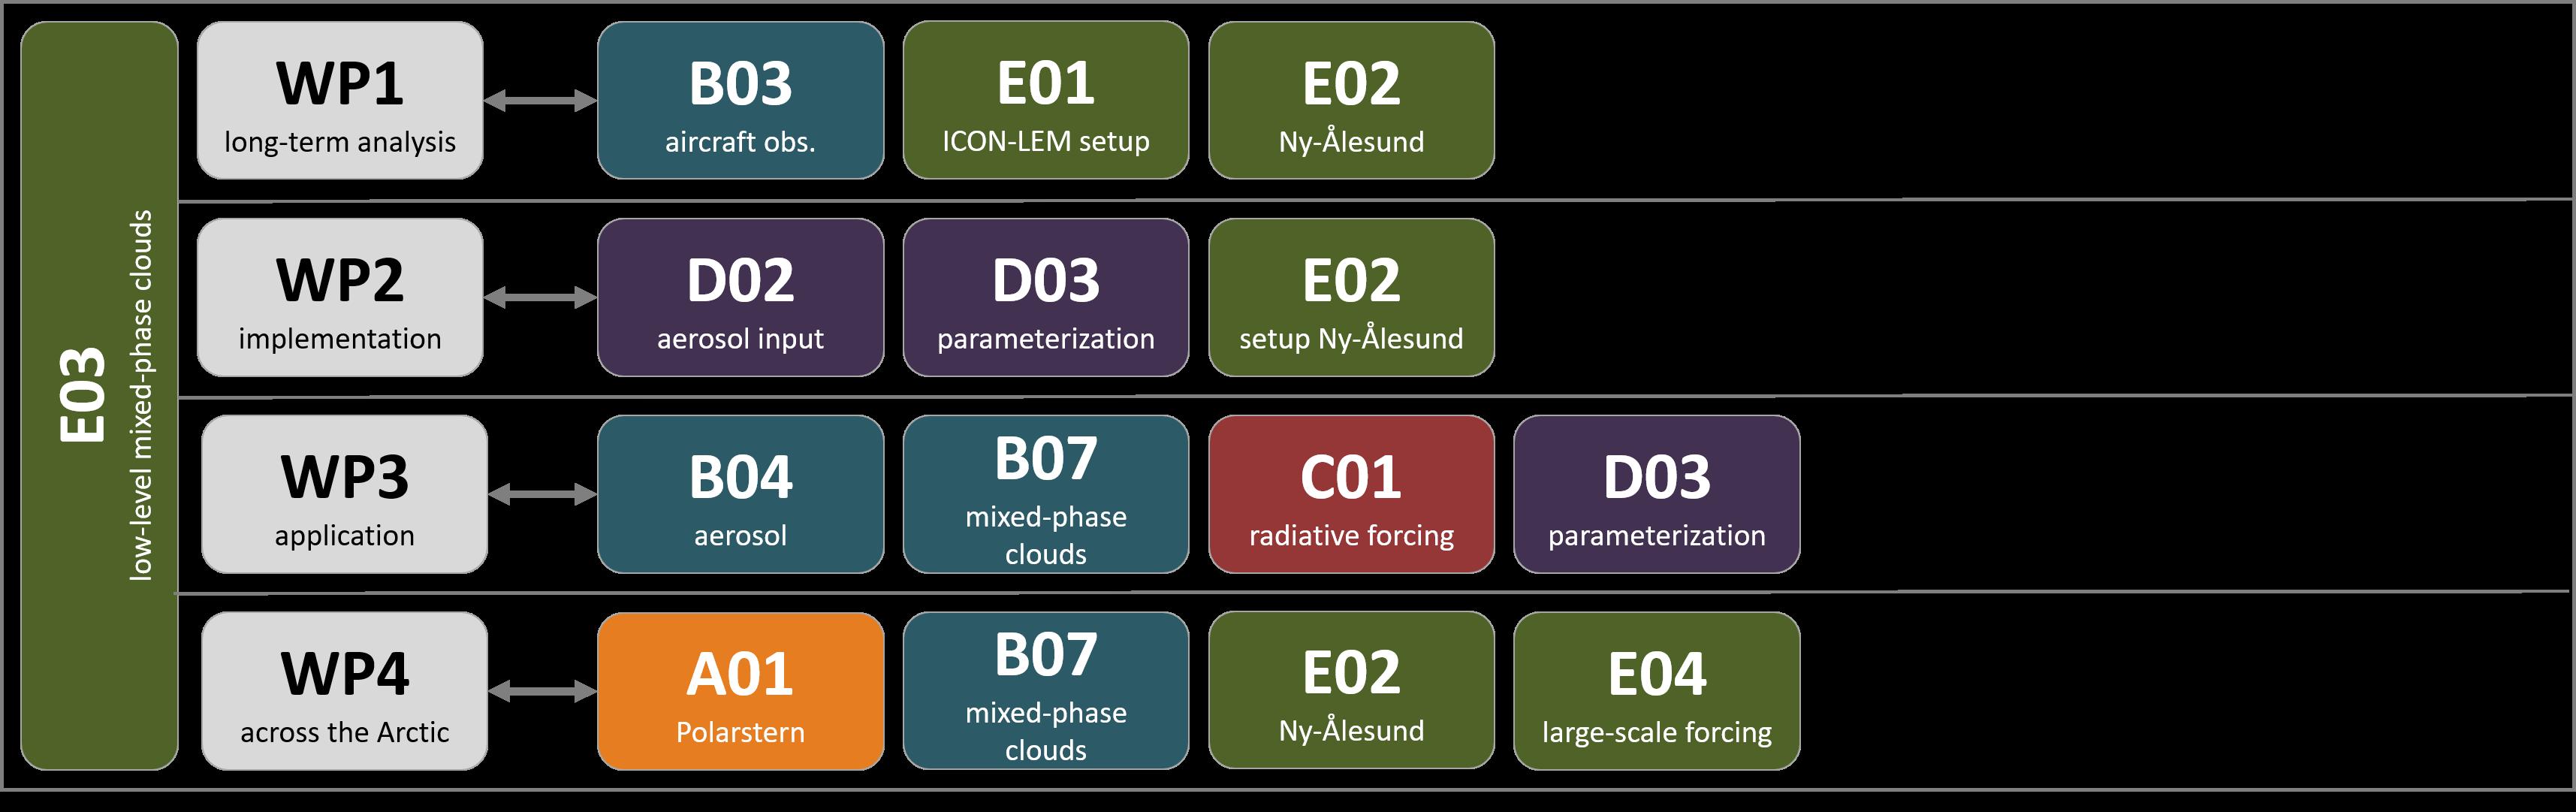 E03_coll